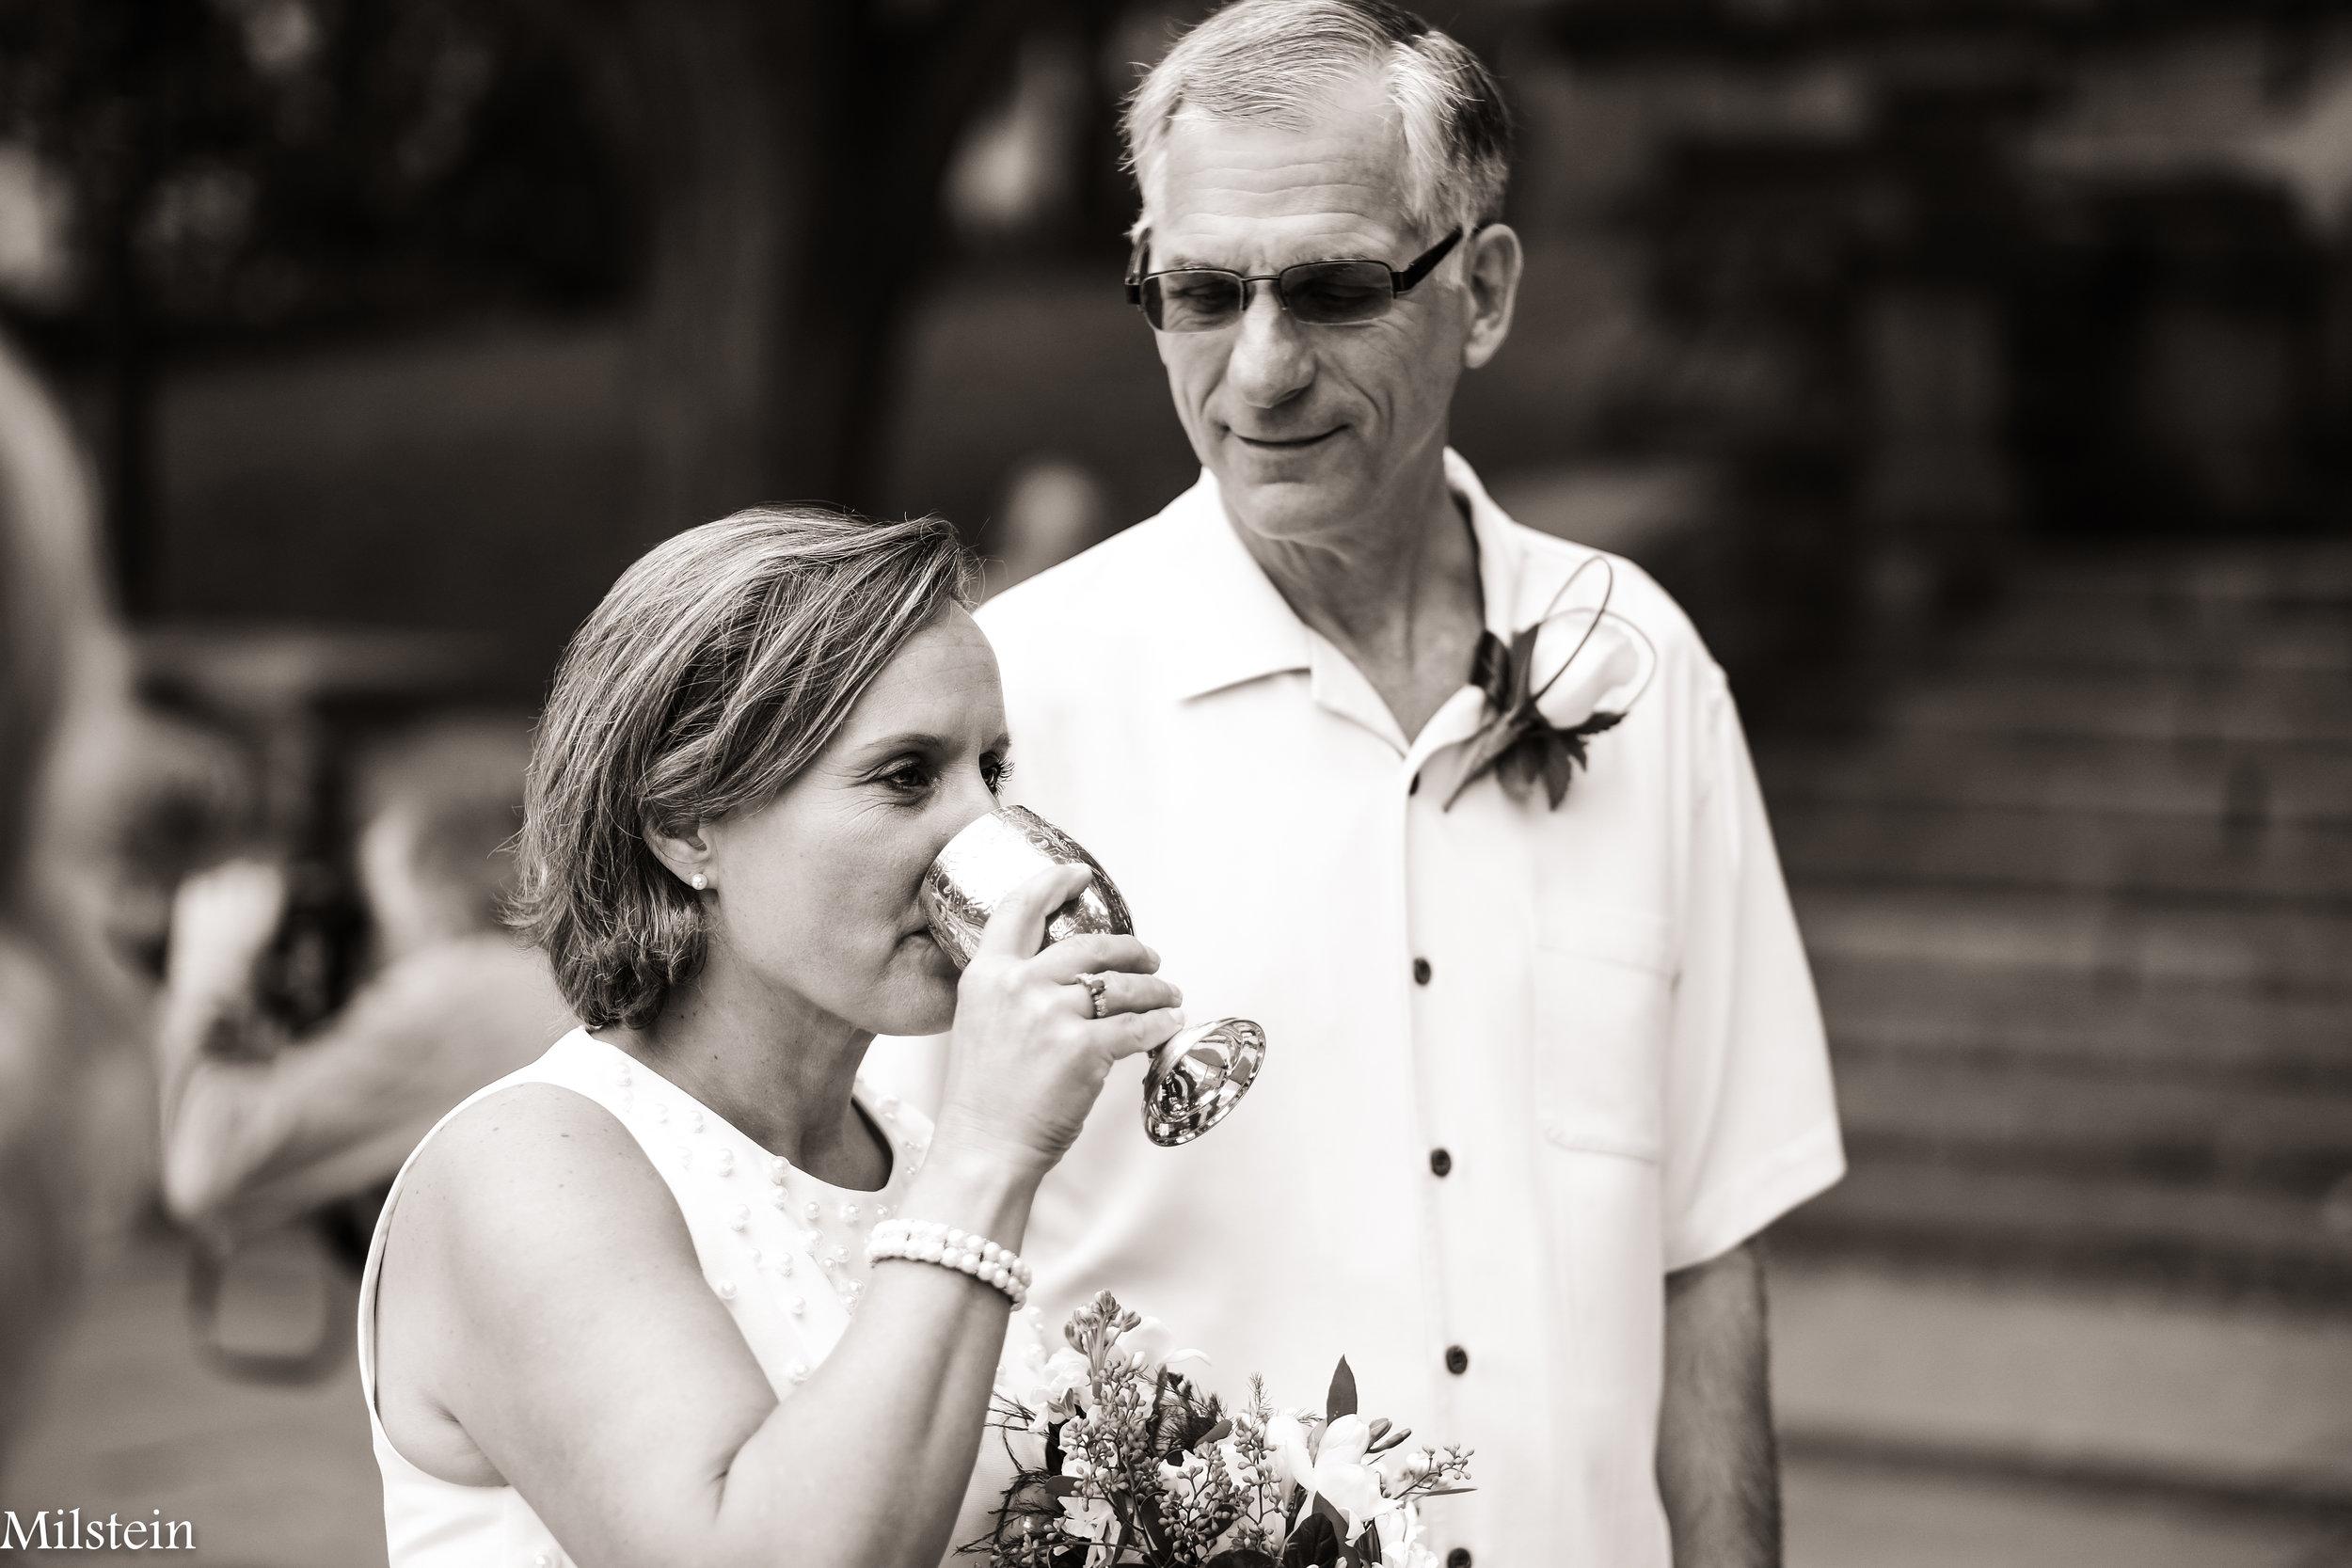 Amy-Milstein-Wedding-Photographer-New-York.jpg